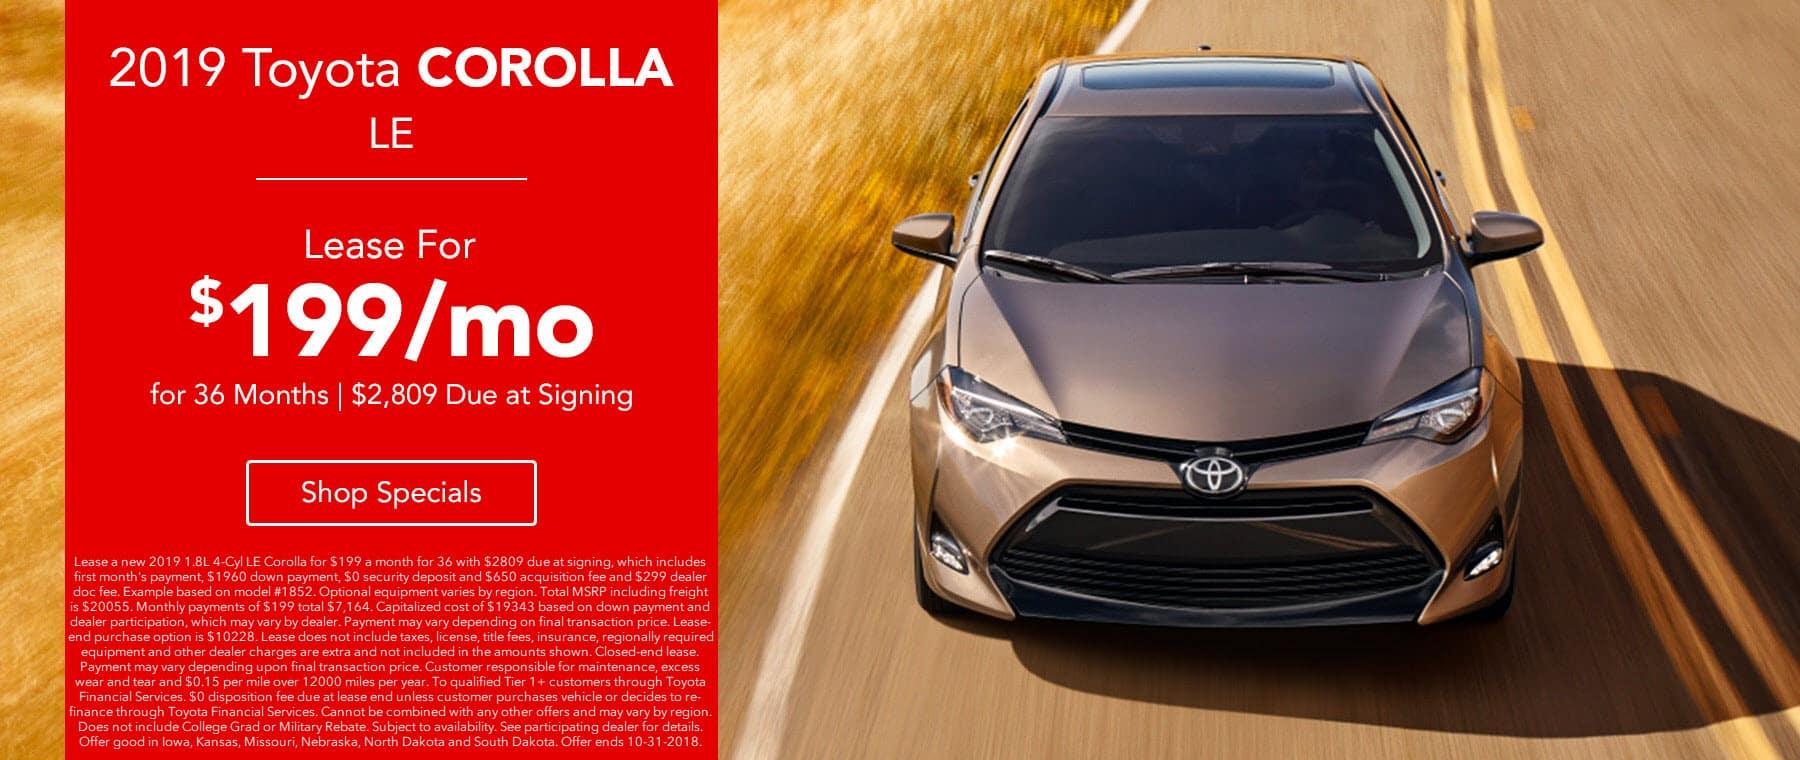 2018 Toyota Carolla